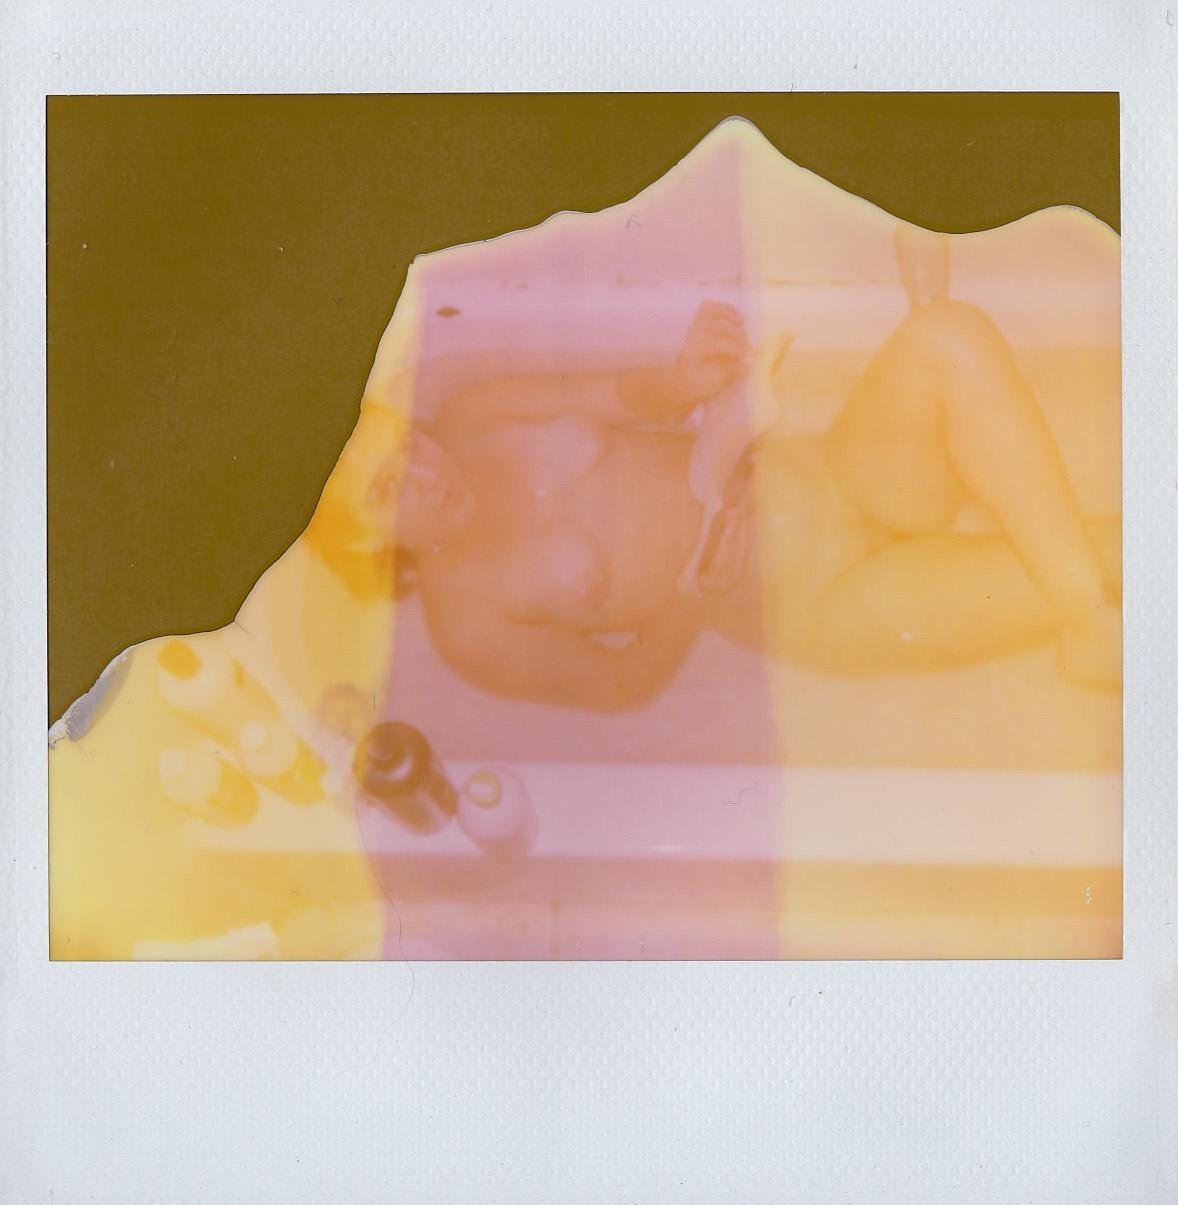 Rosie Lopeman in the bath - December 2016 - Brooklyn, NY - Expired Polaroid Spectra